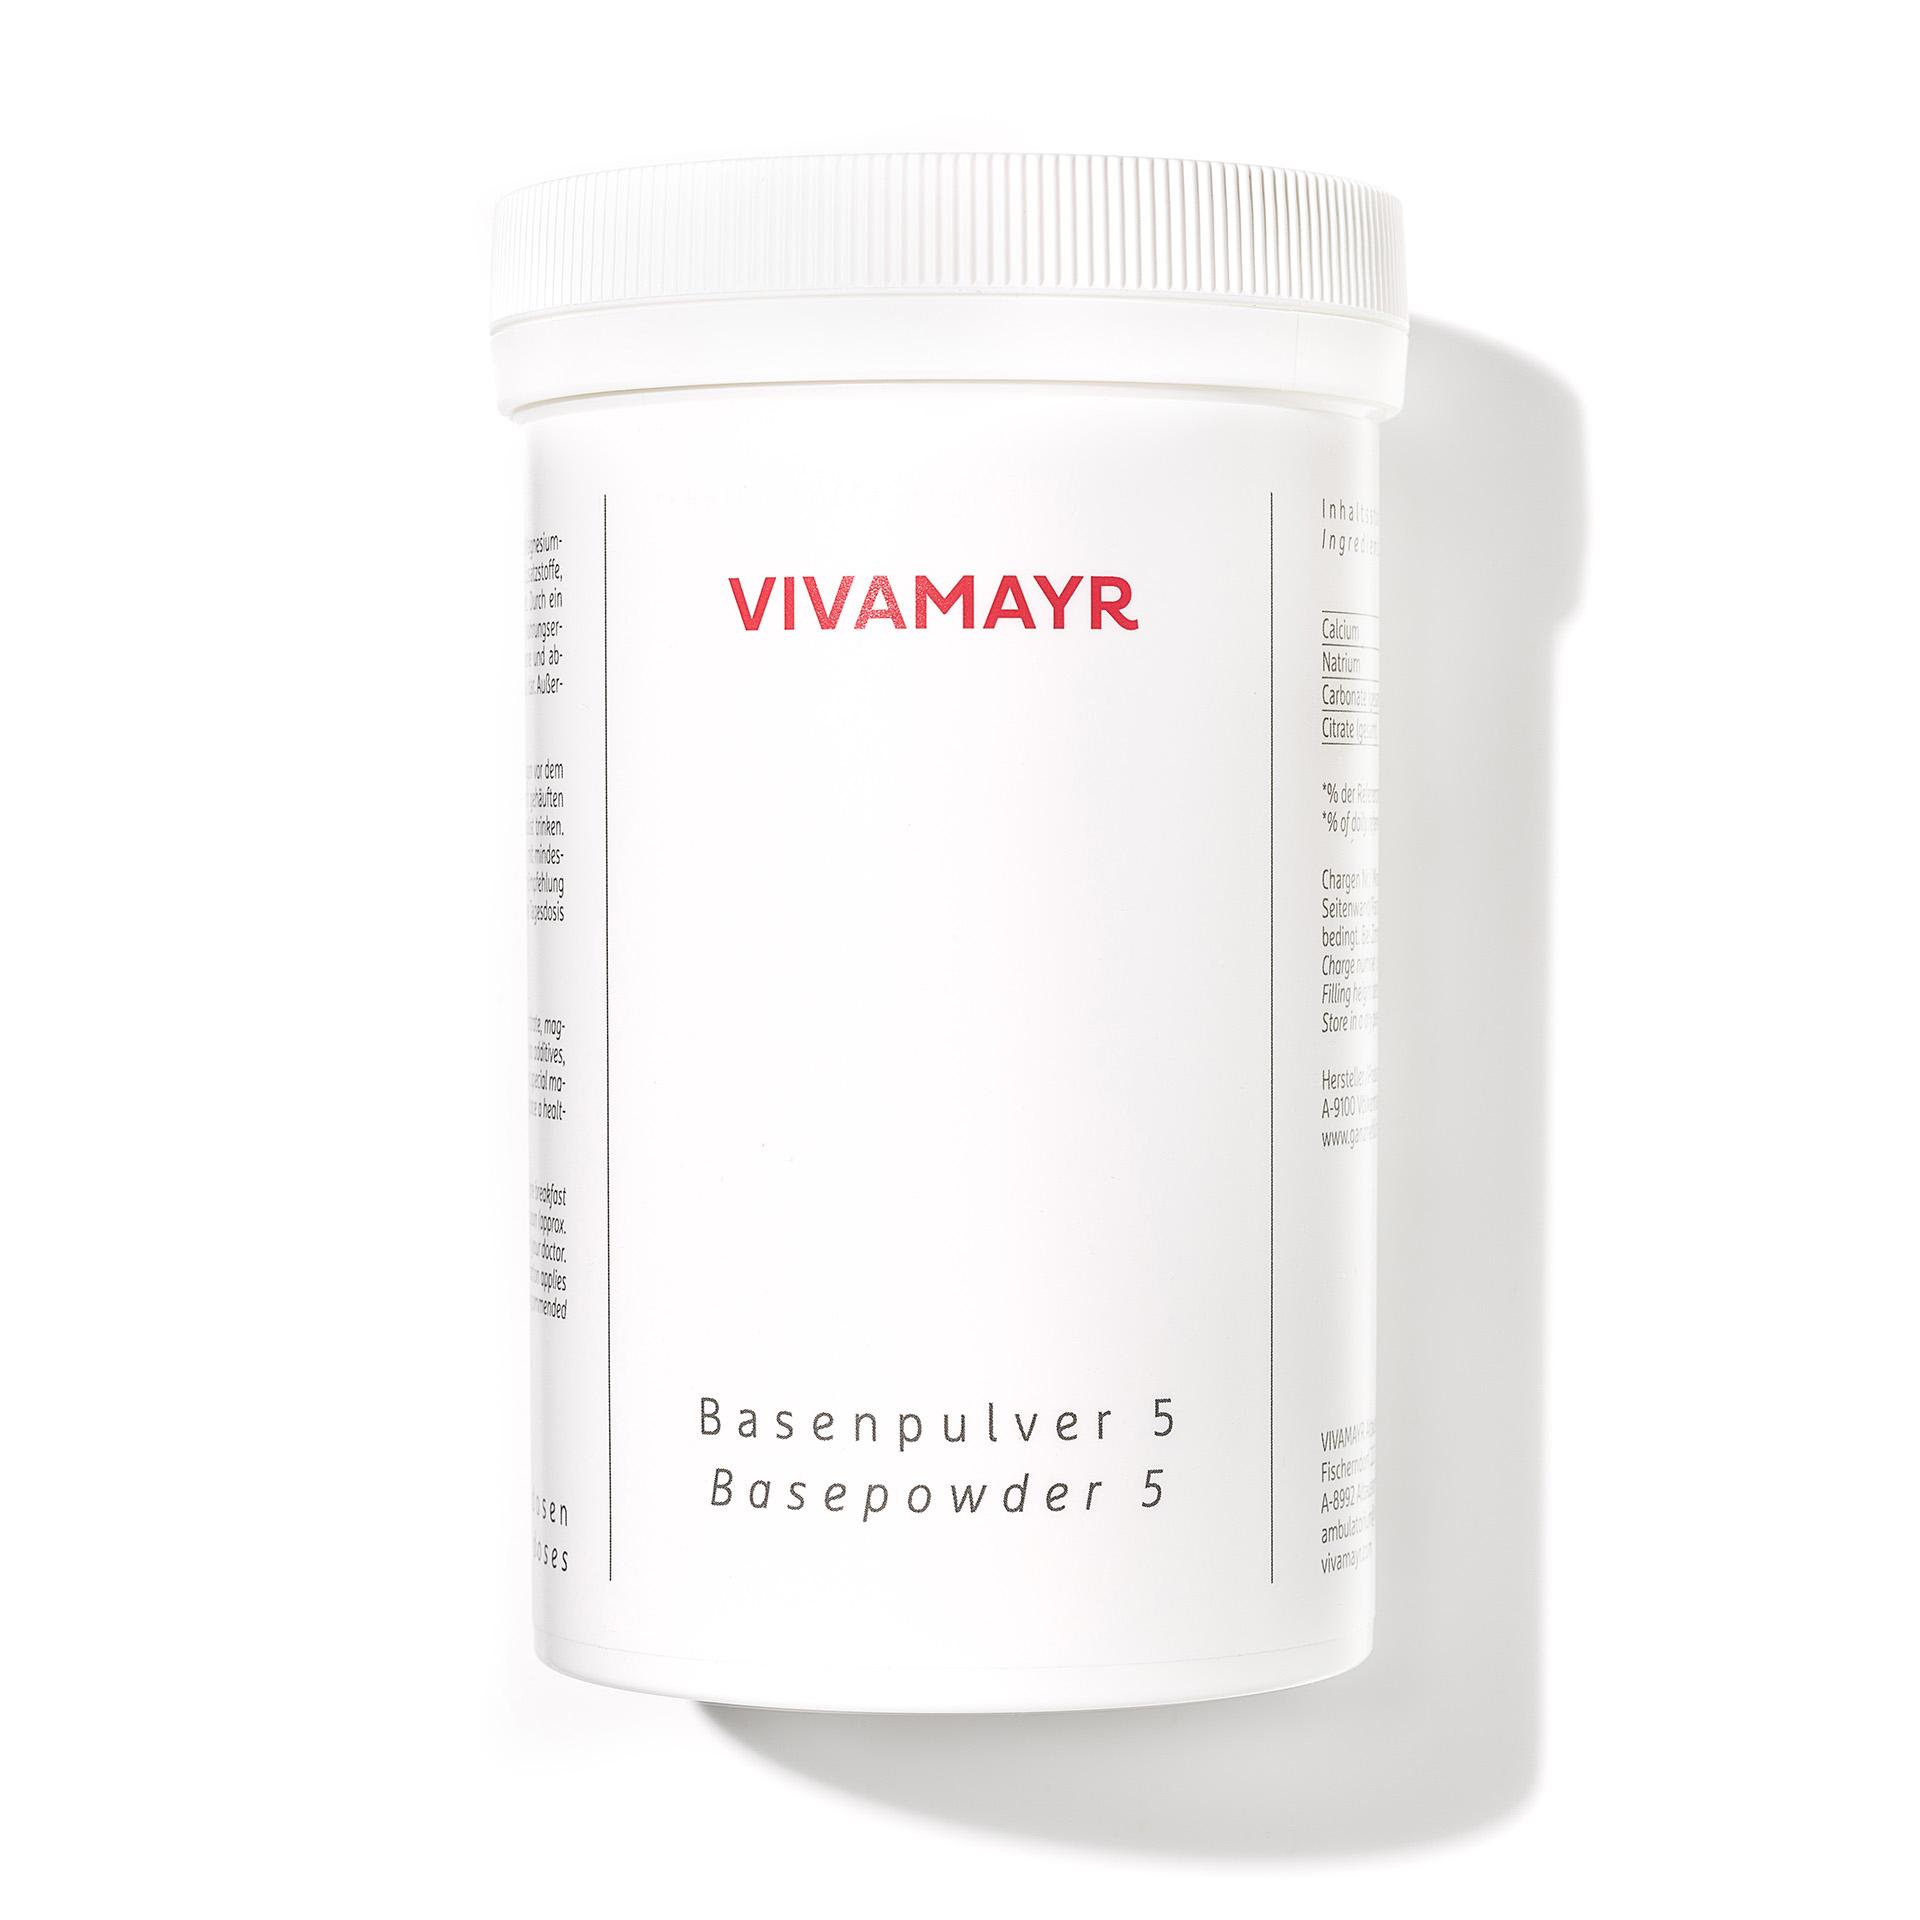 VIVAMAYR Basepowder 5